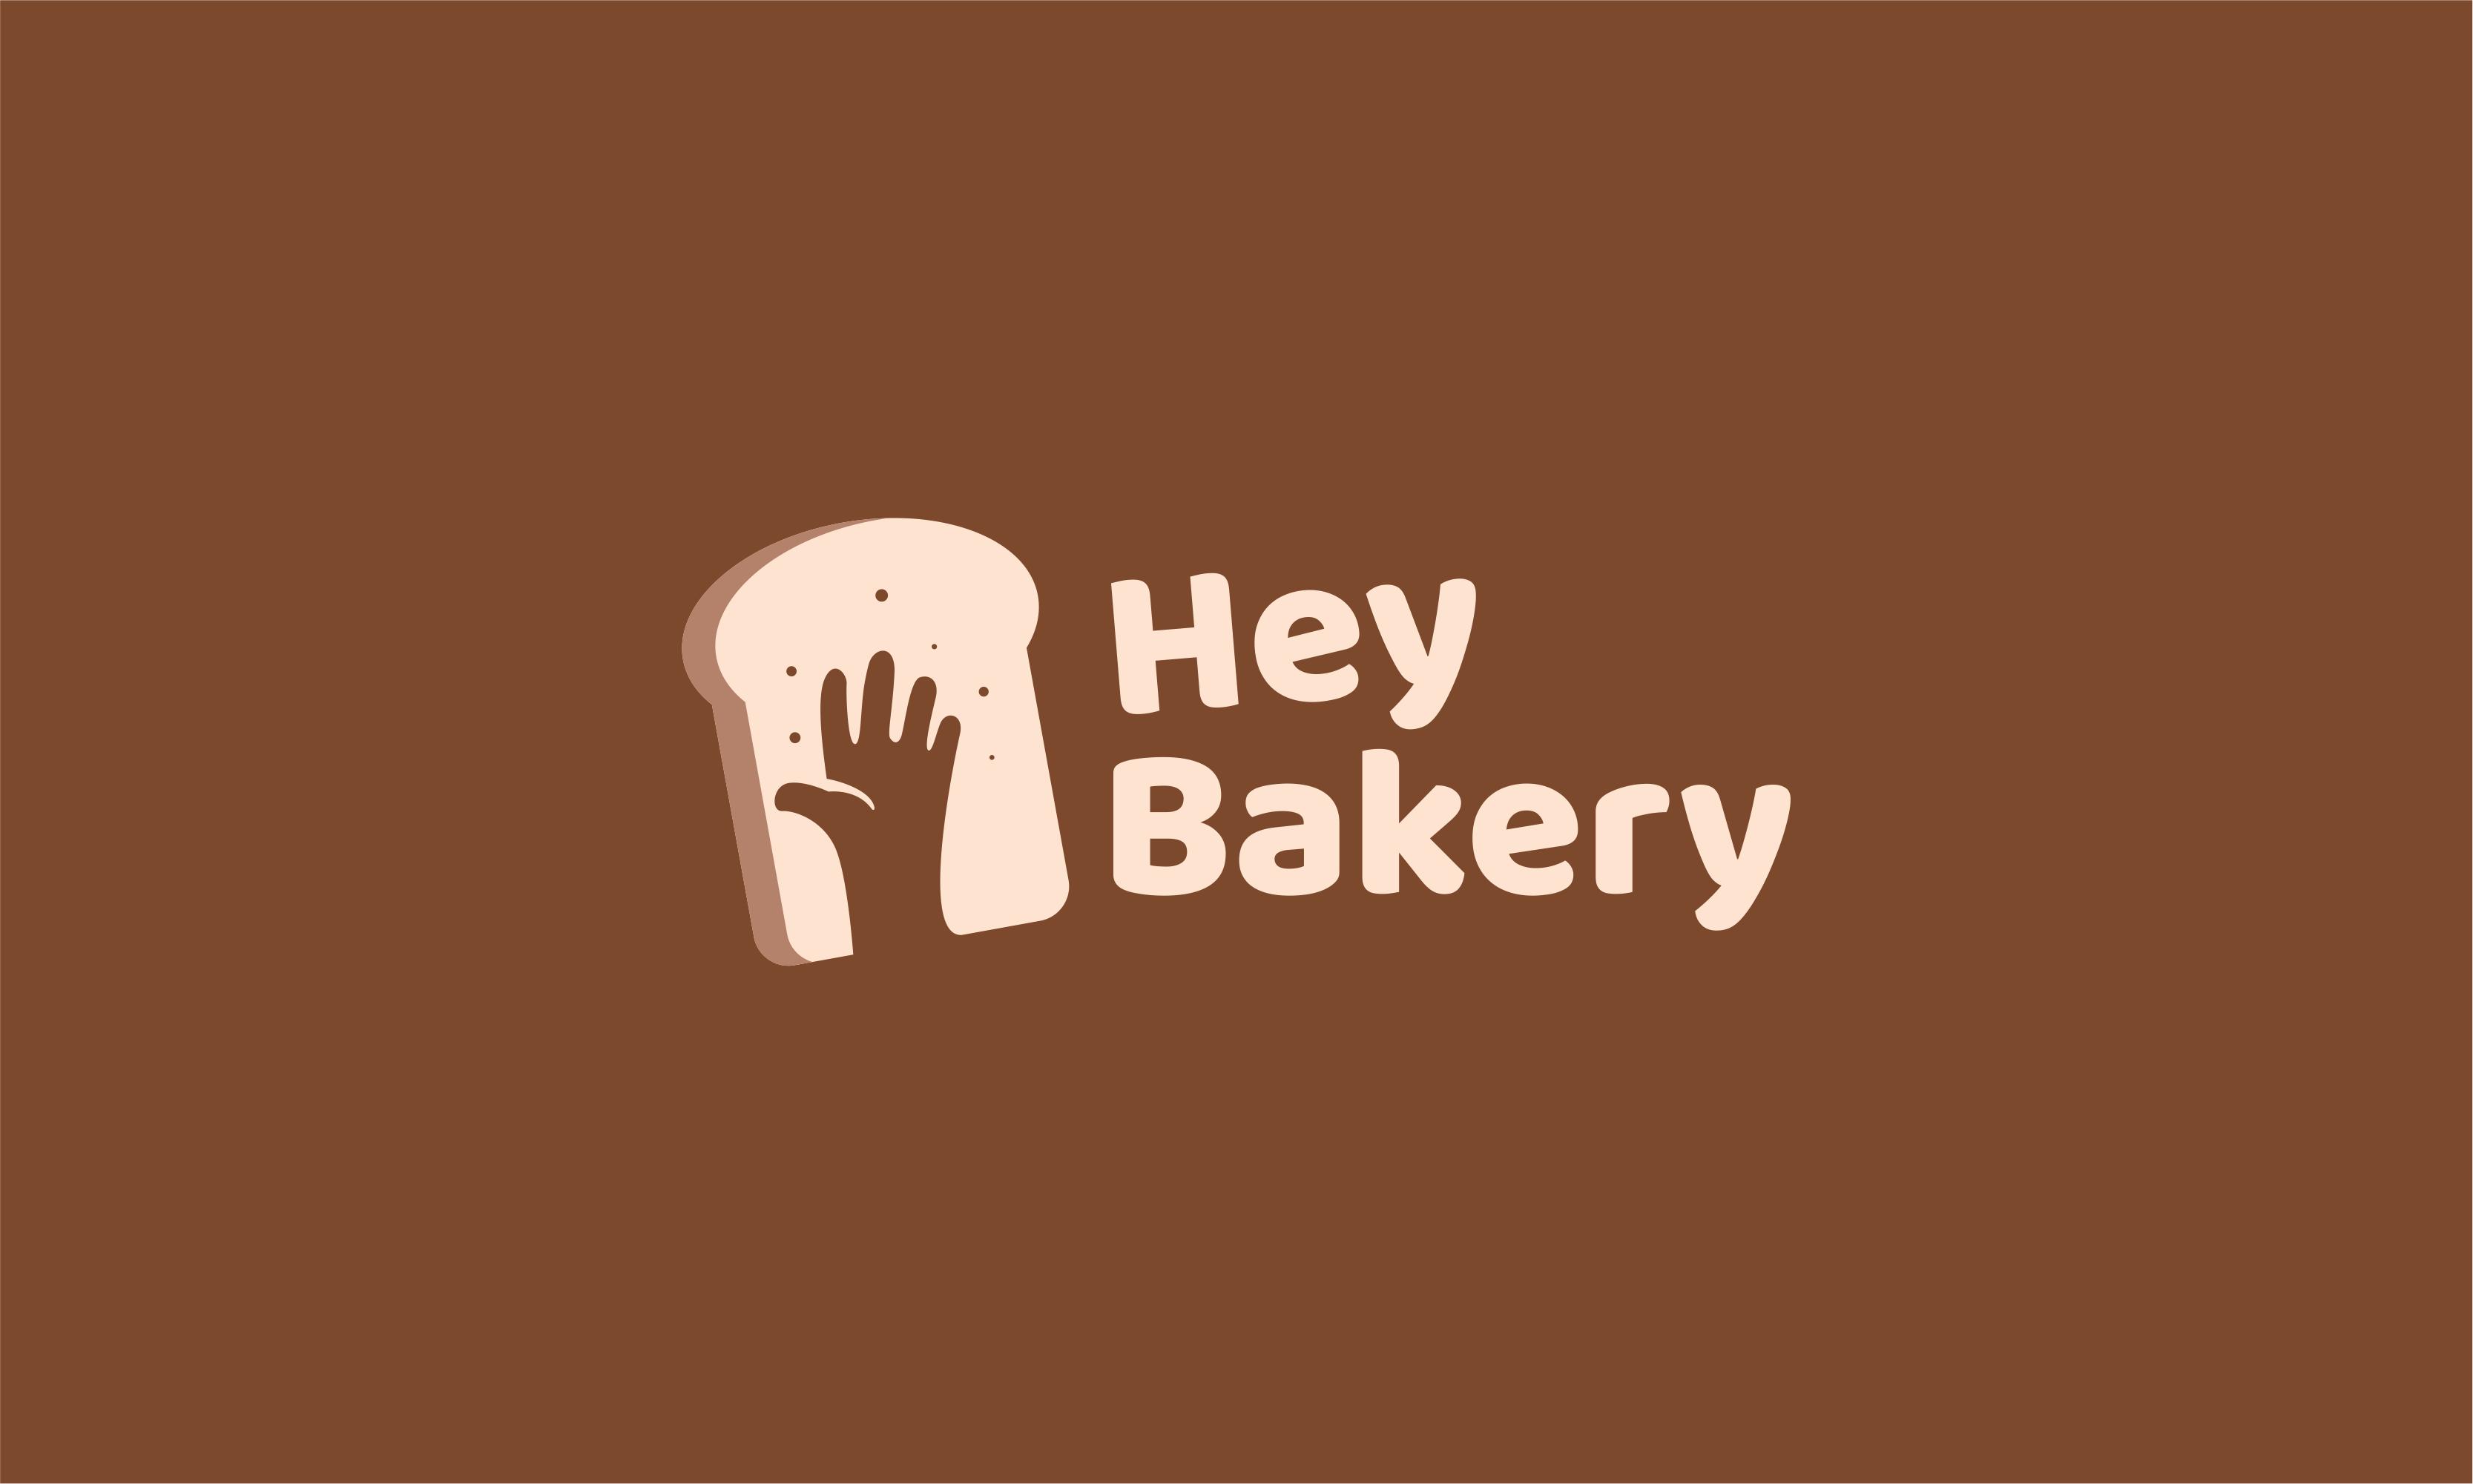 Heybakery